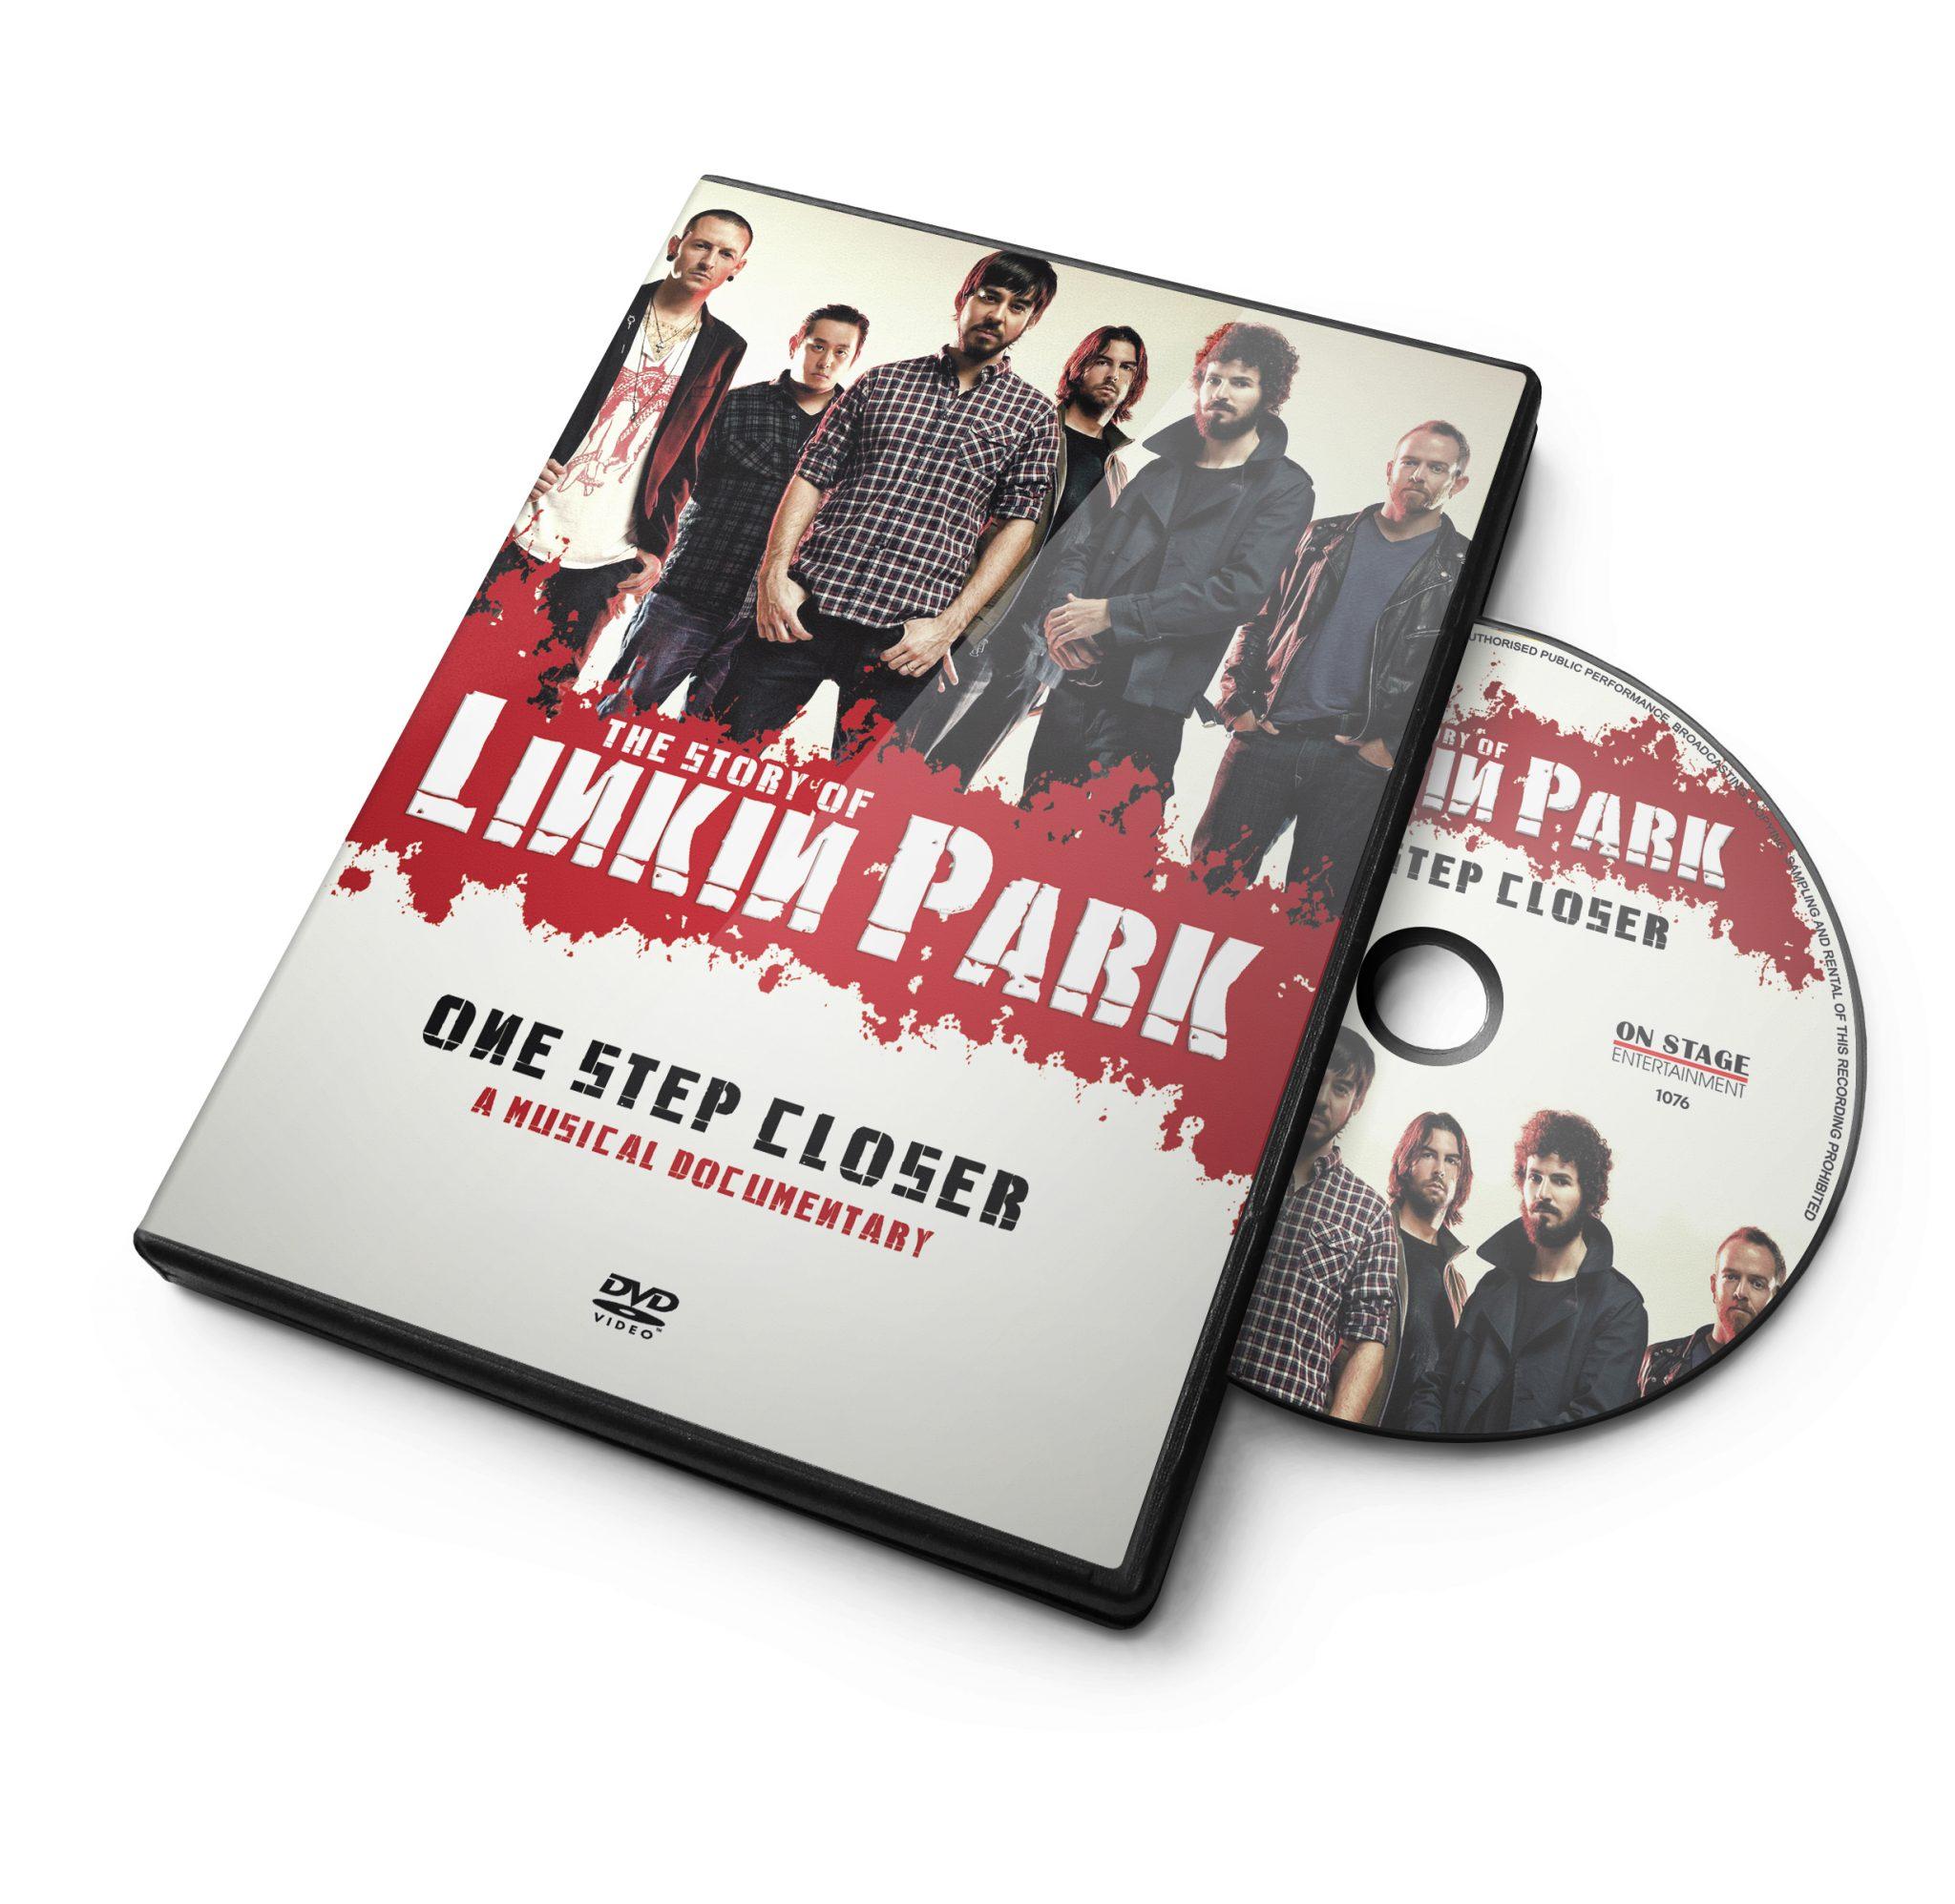 linkin park docu_dvd